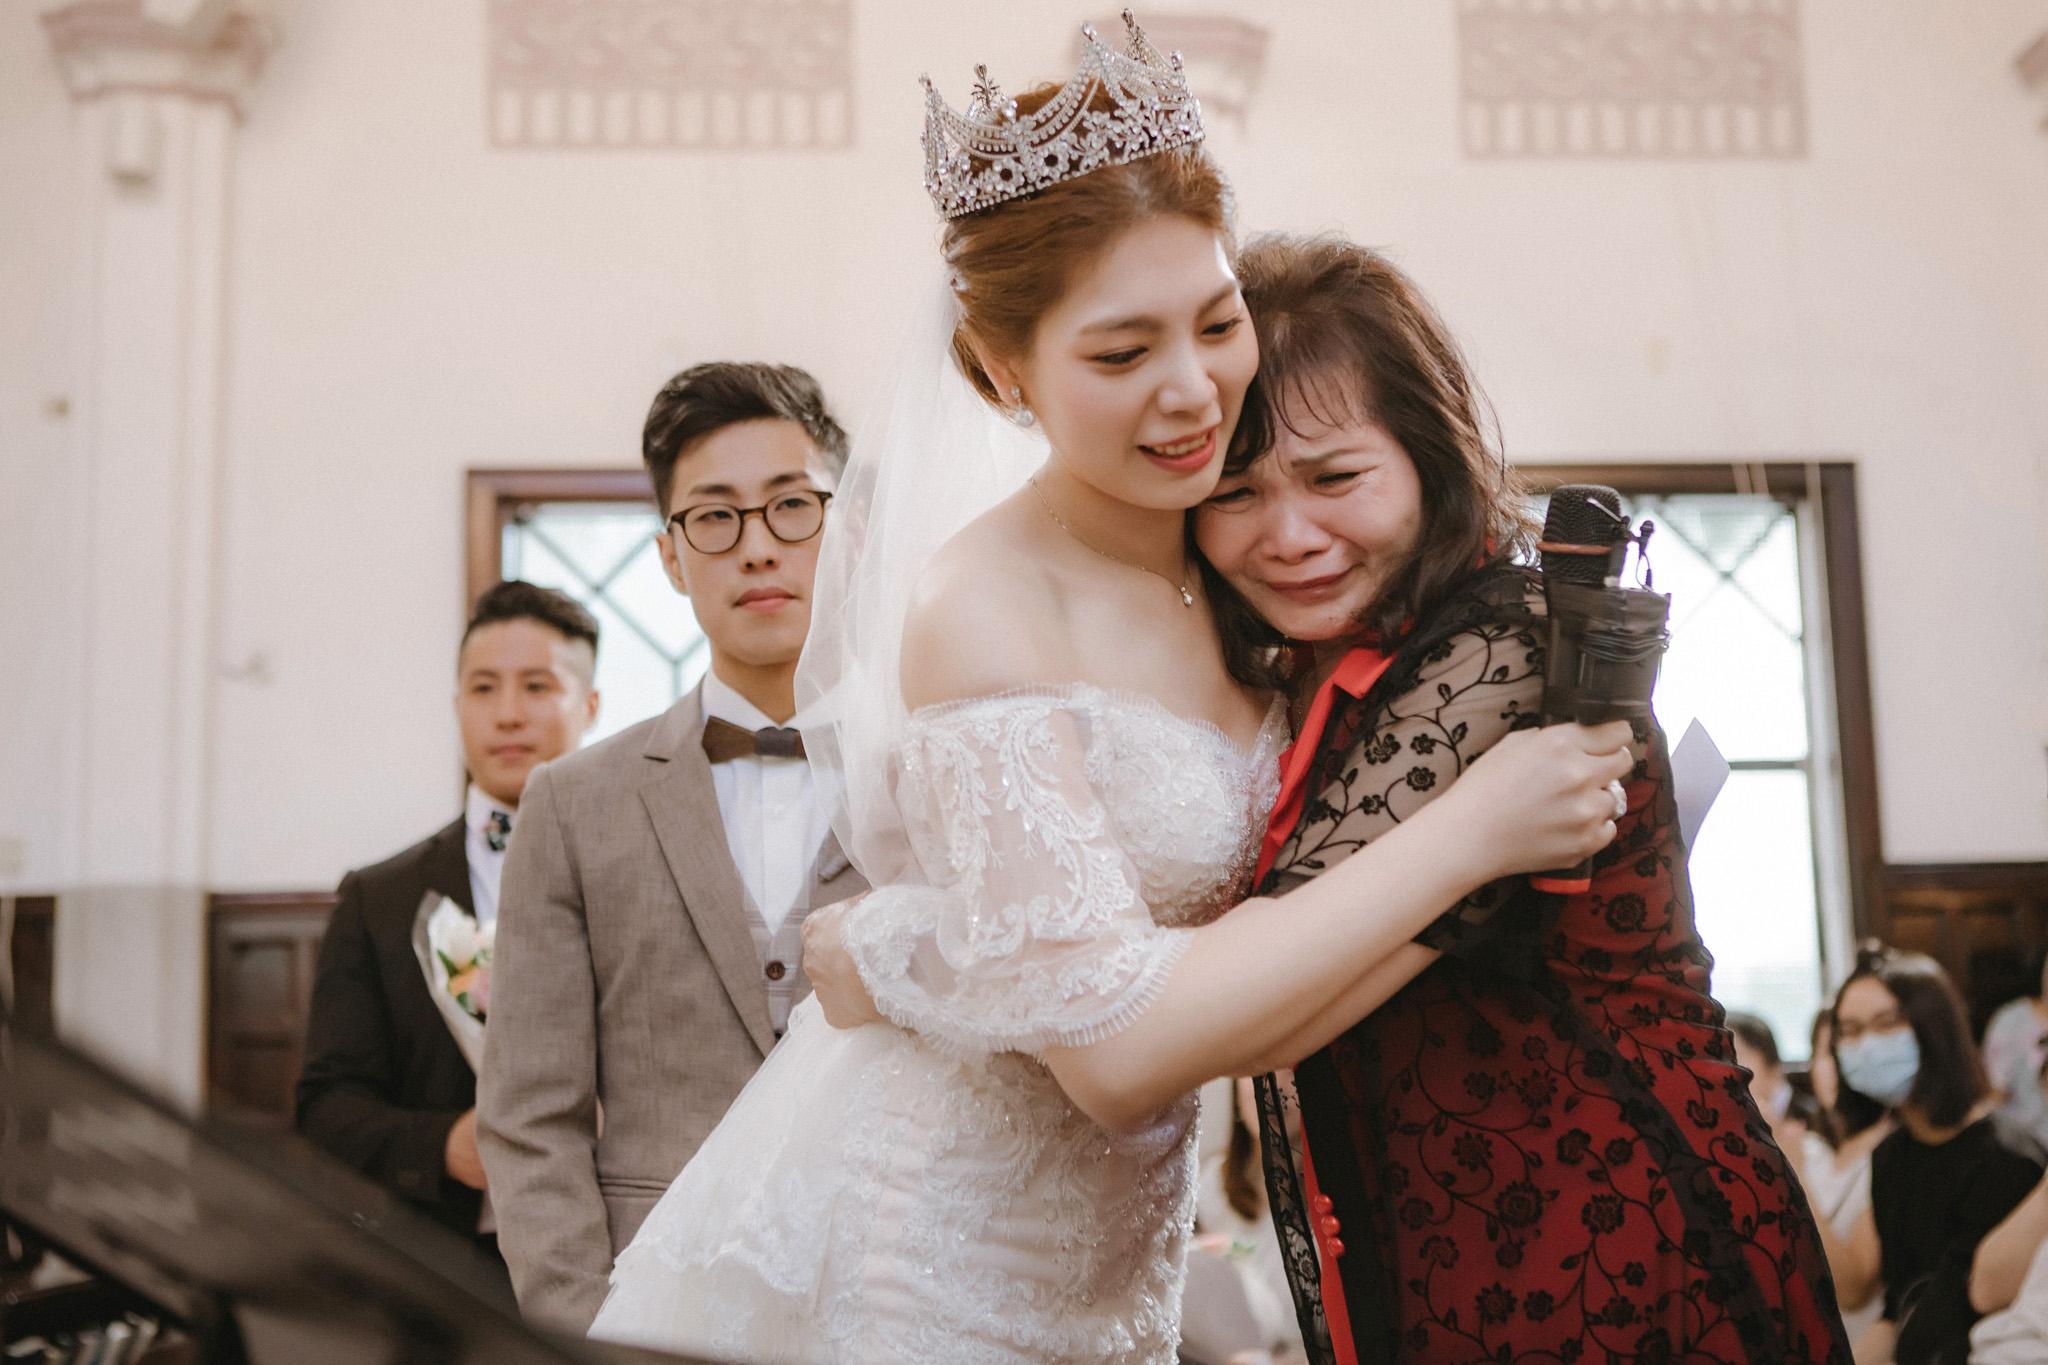 EW 台北婚攝 居米 濟南教會 Brick Yard 33 美軍俱樂部 婚禮 婚宴-43